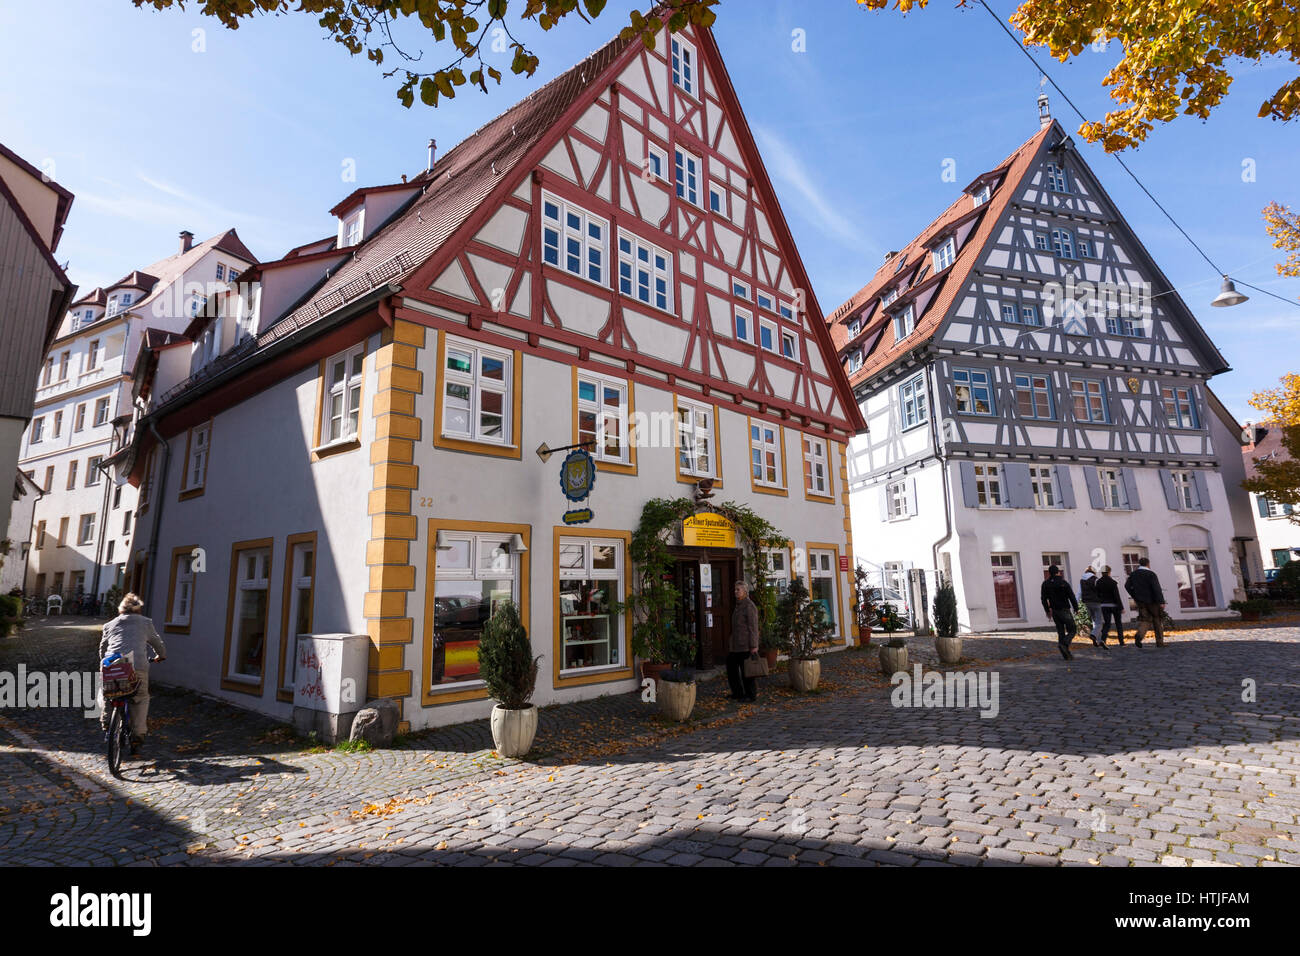 Fischerviertel, The Fishermen's and Tanners' quarter in Ulm, Baden-Württemberg, Germany Stock Photo